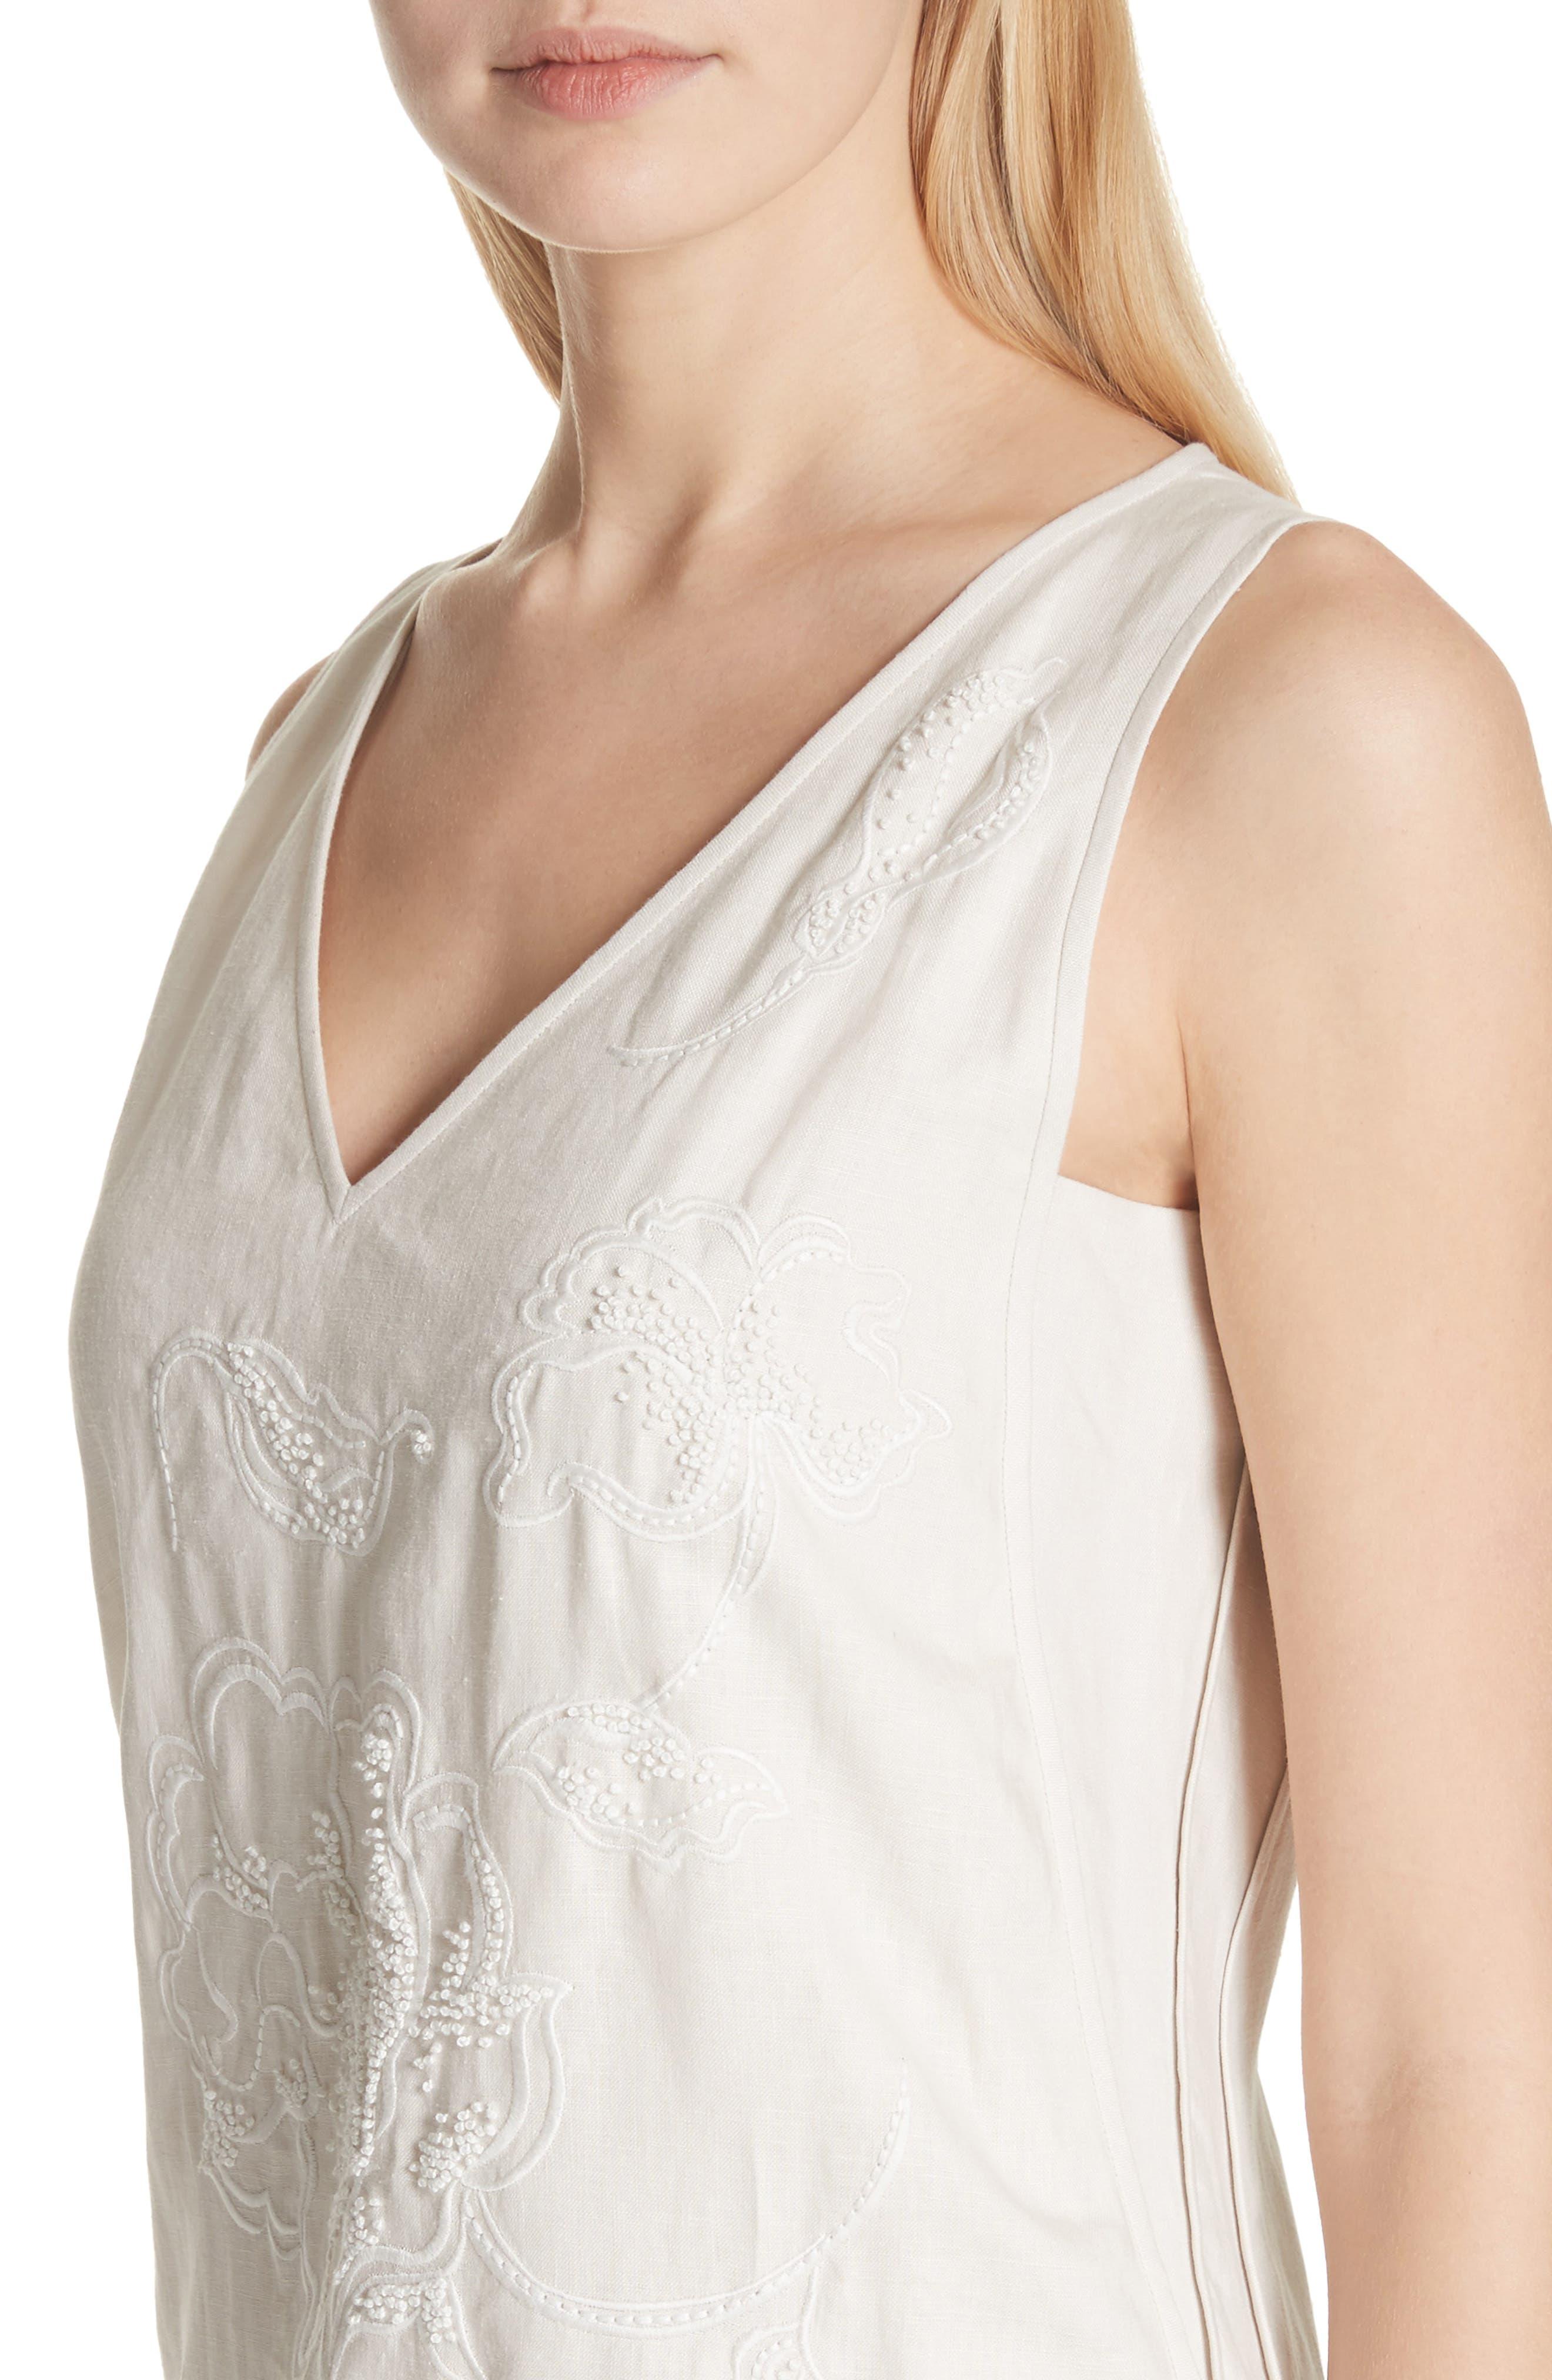 Duncan Embroidered Linen Dress,                             Alternate thumbnail 4, color,                             Raffia